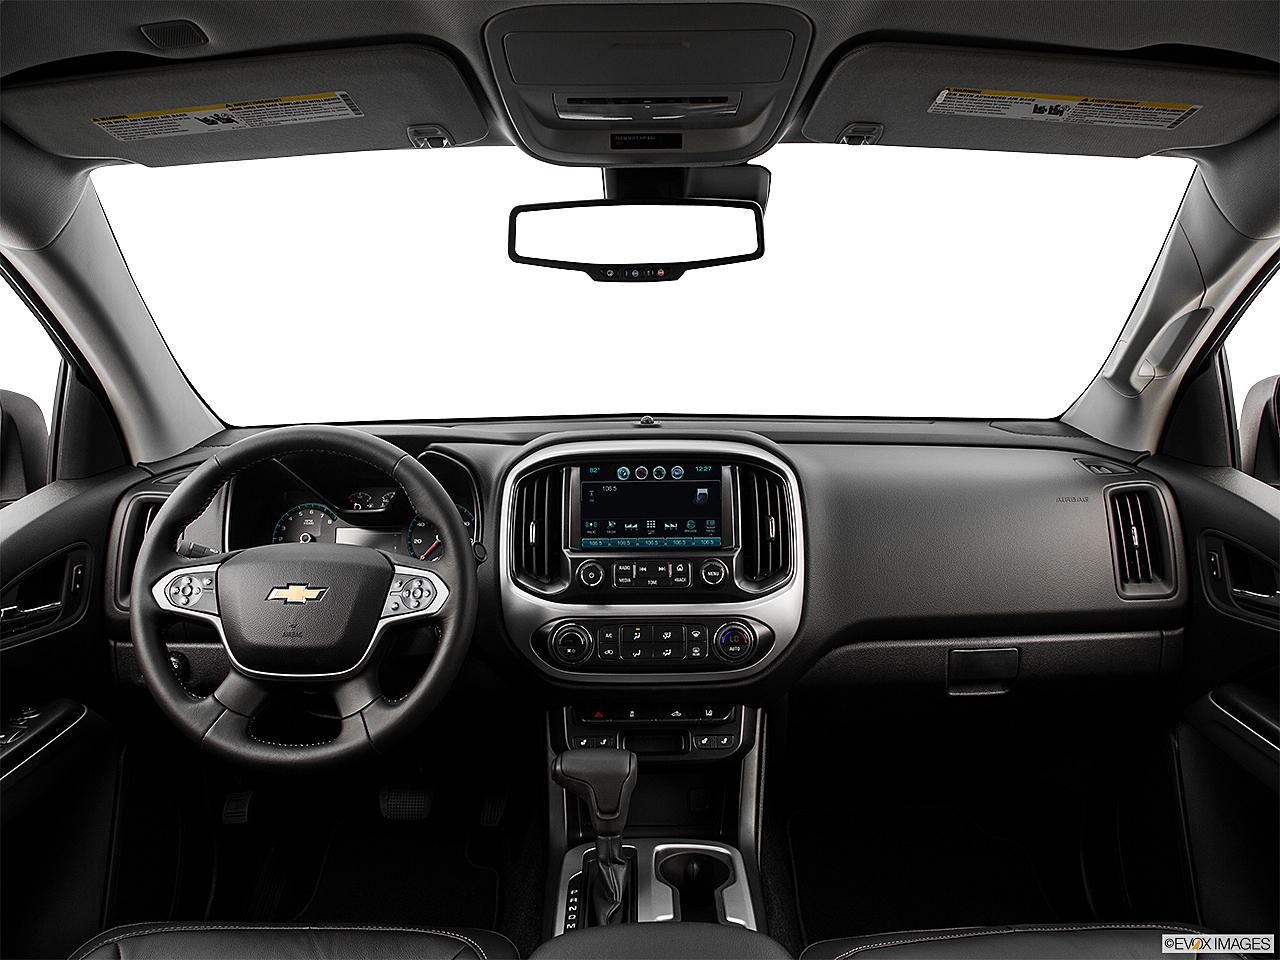 2017 Chevrolet Colorado 4x2 Lt 4dr Crew Cab 5 Ft Sb Research Groovecar